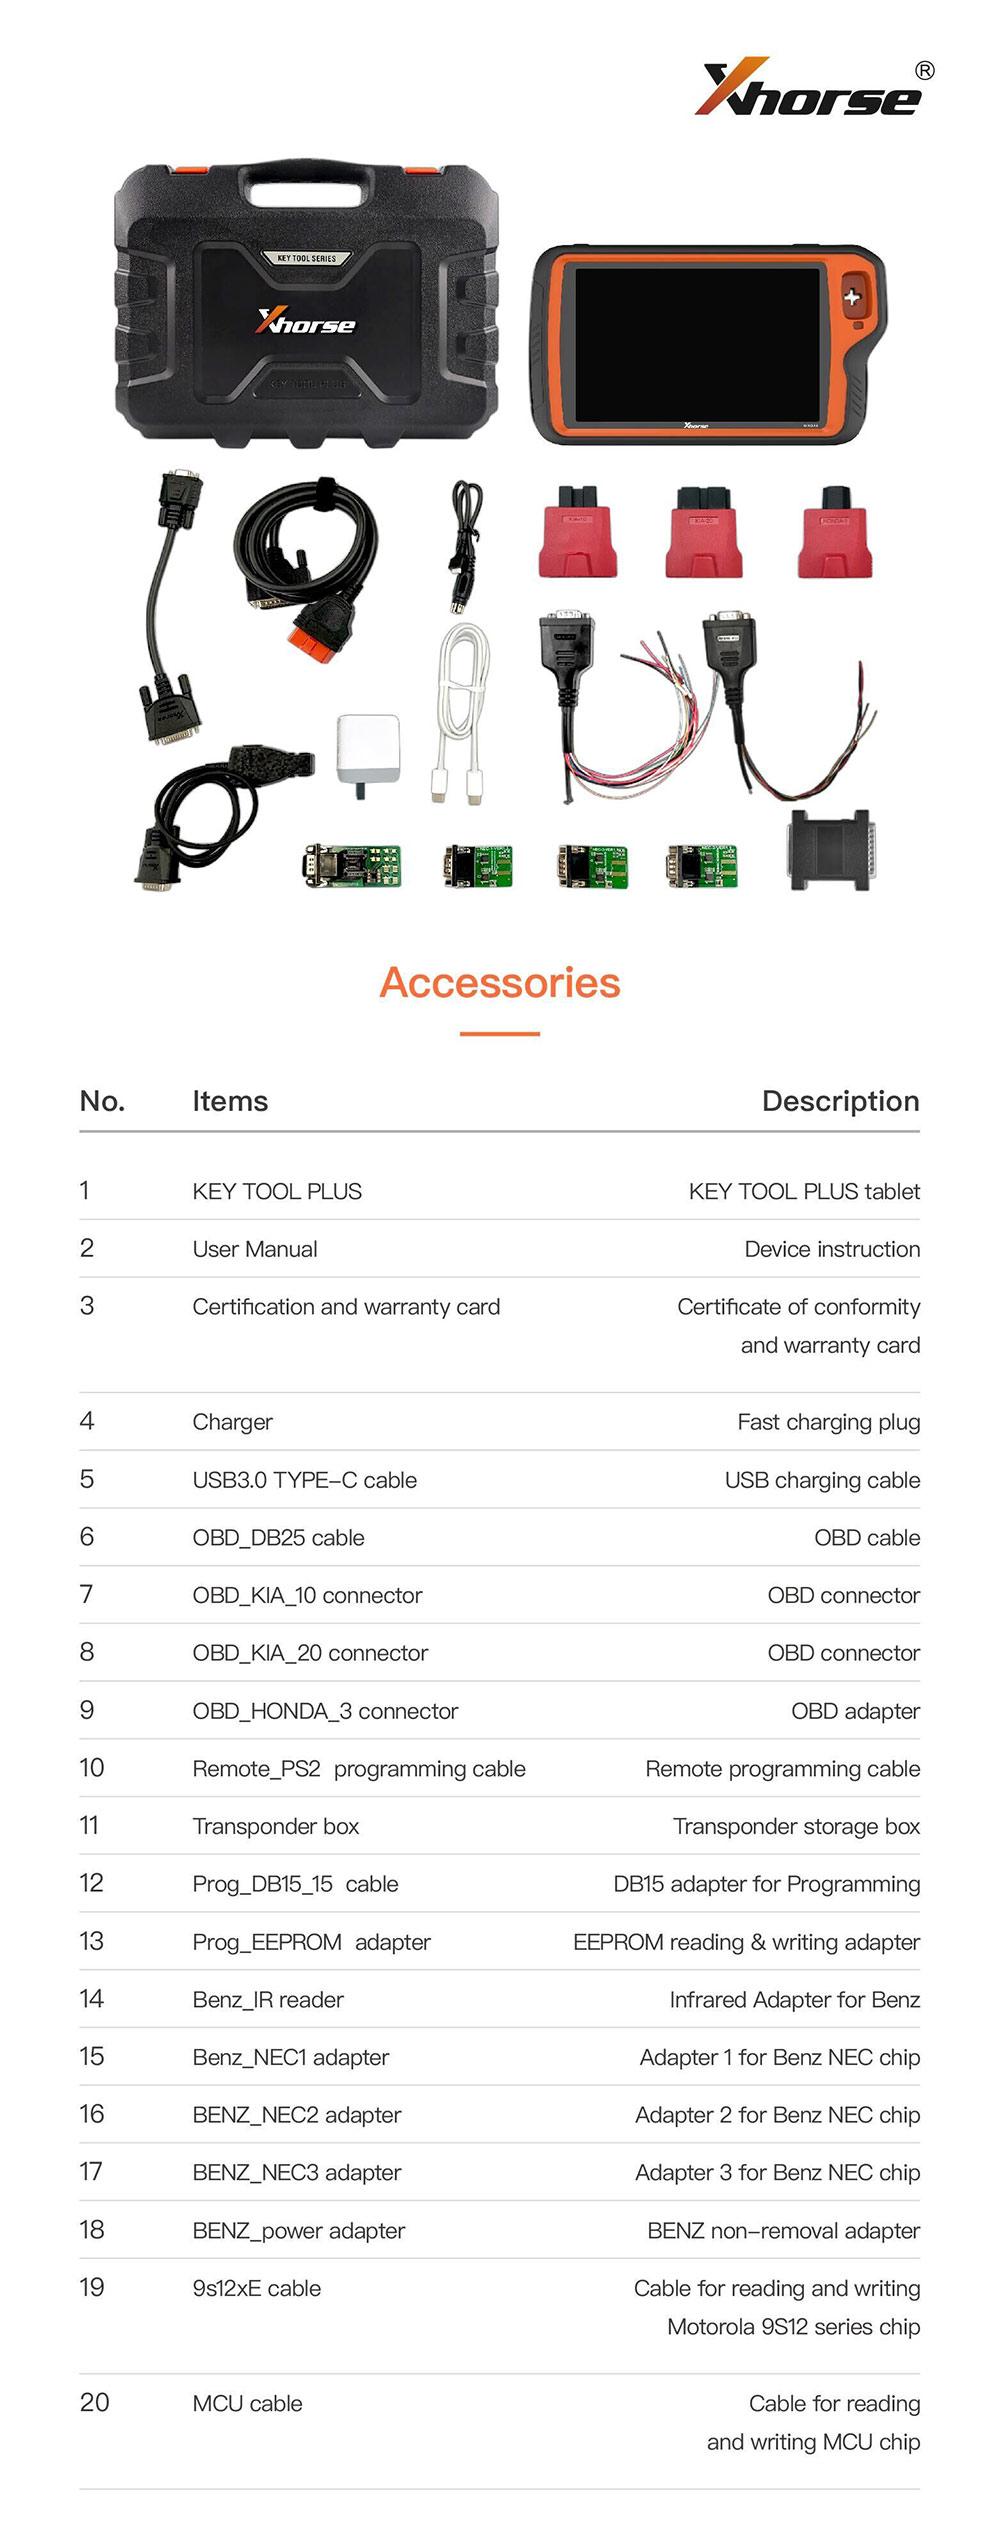 Xhorse VVDI Key Tool Plus Package List